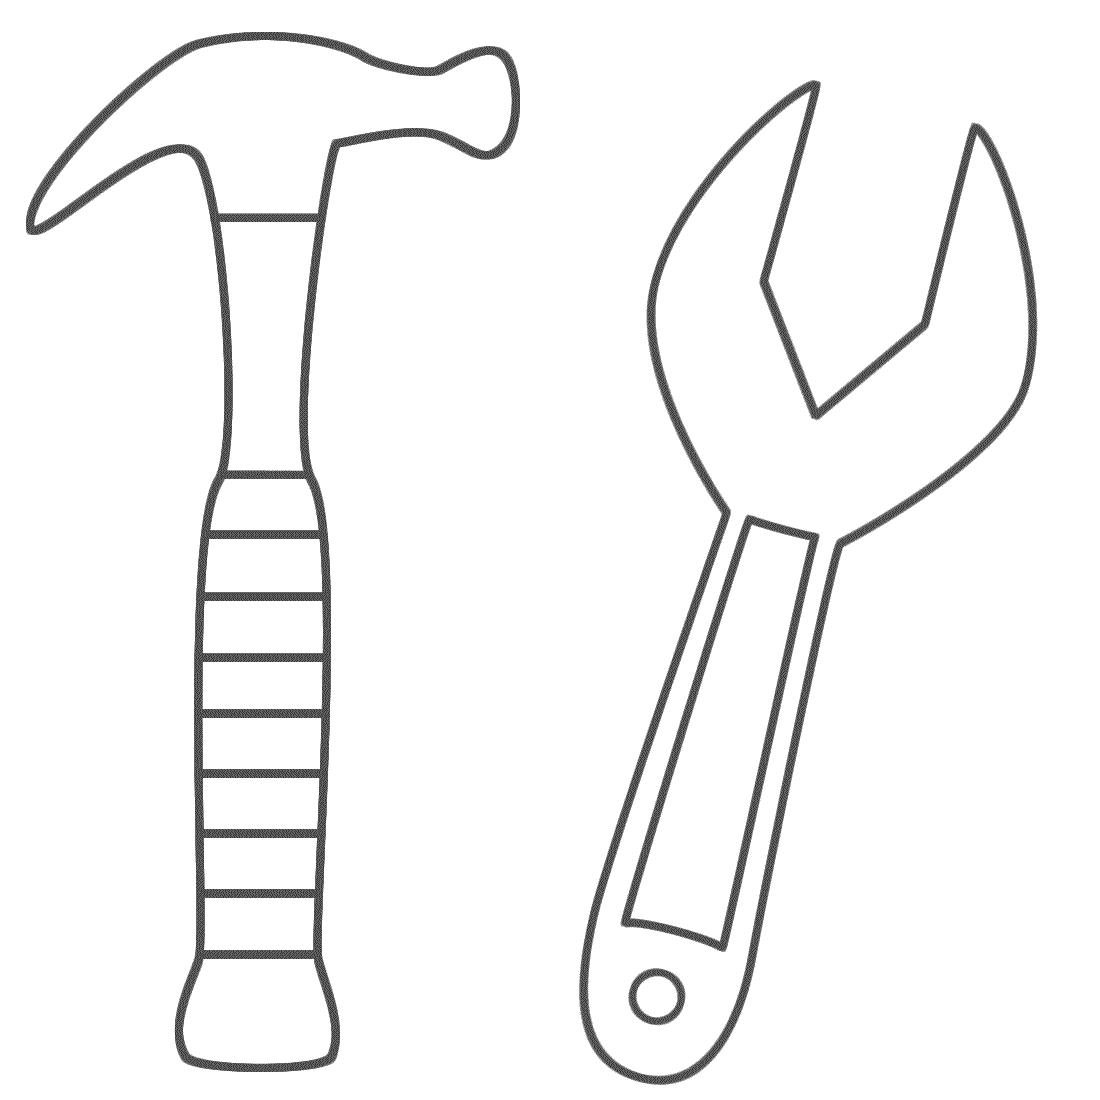 Hammer coloring #12, Download drawings